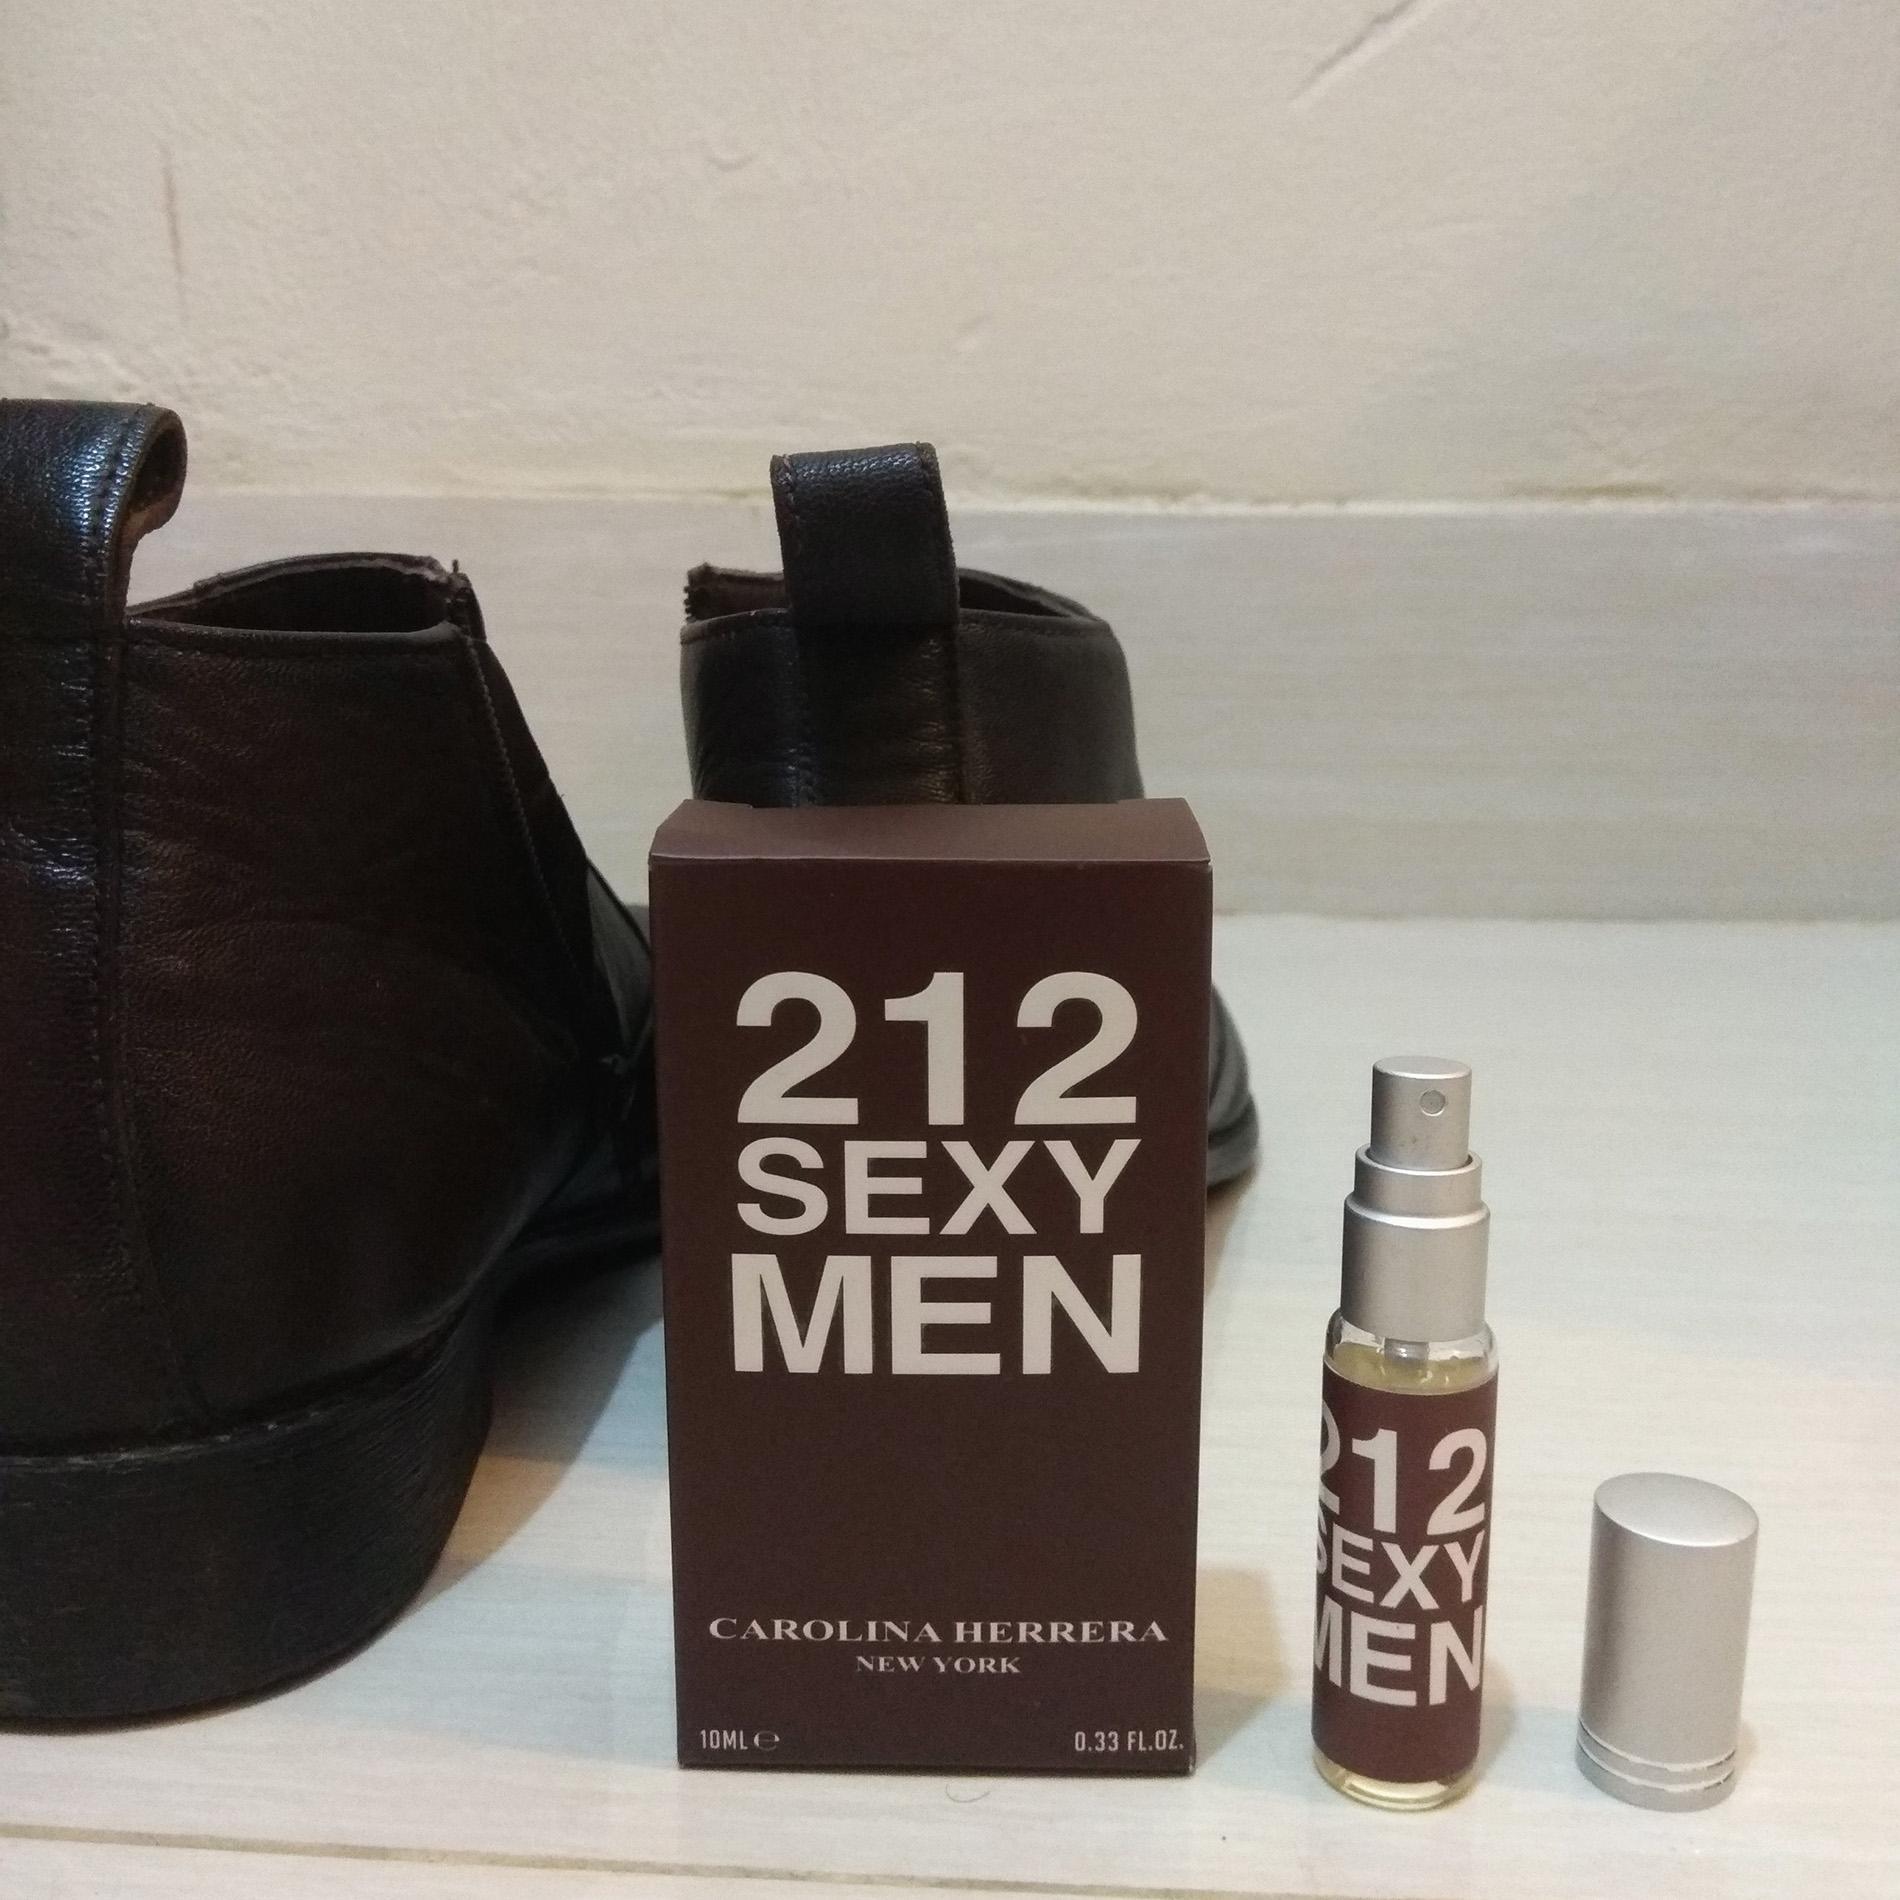 a0e444bab6 Carolina Herrera 212 Men Nyc Perfume - 100ml. ৳ 6,200. Bangladesh. 212 Sexy  Men pocket perfume